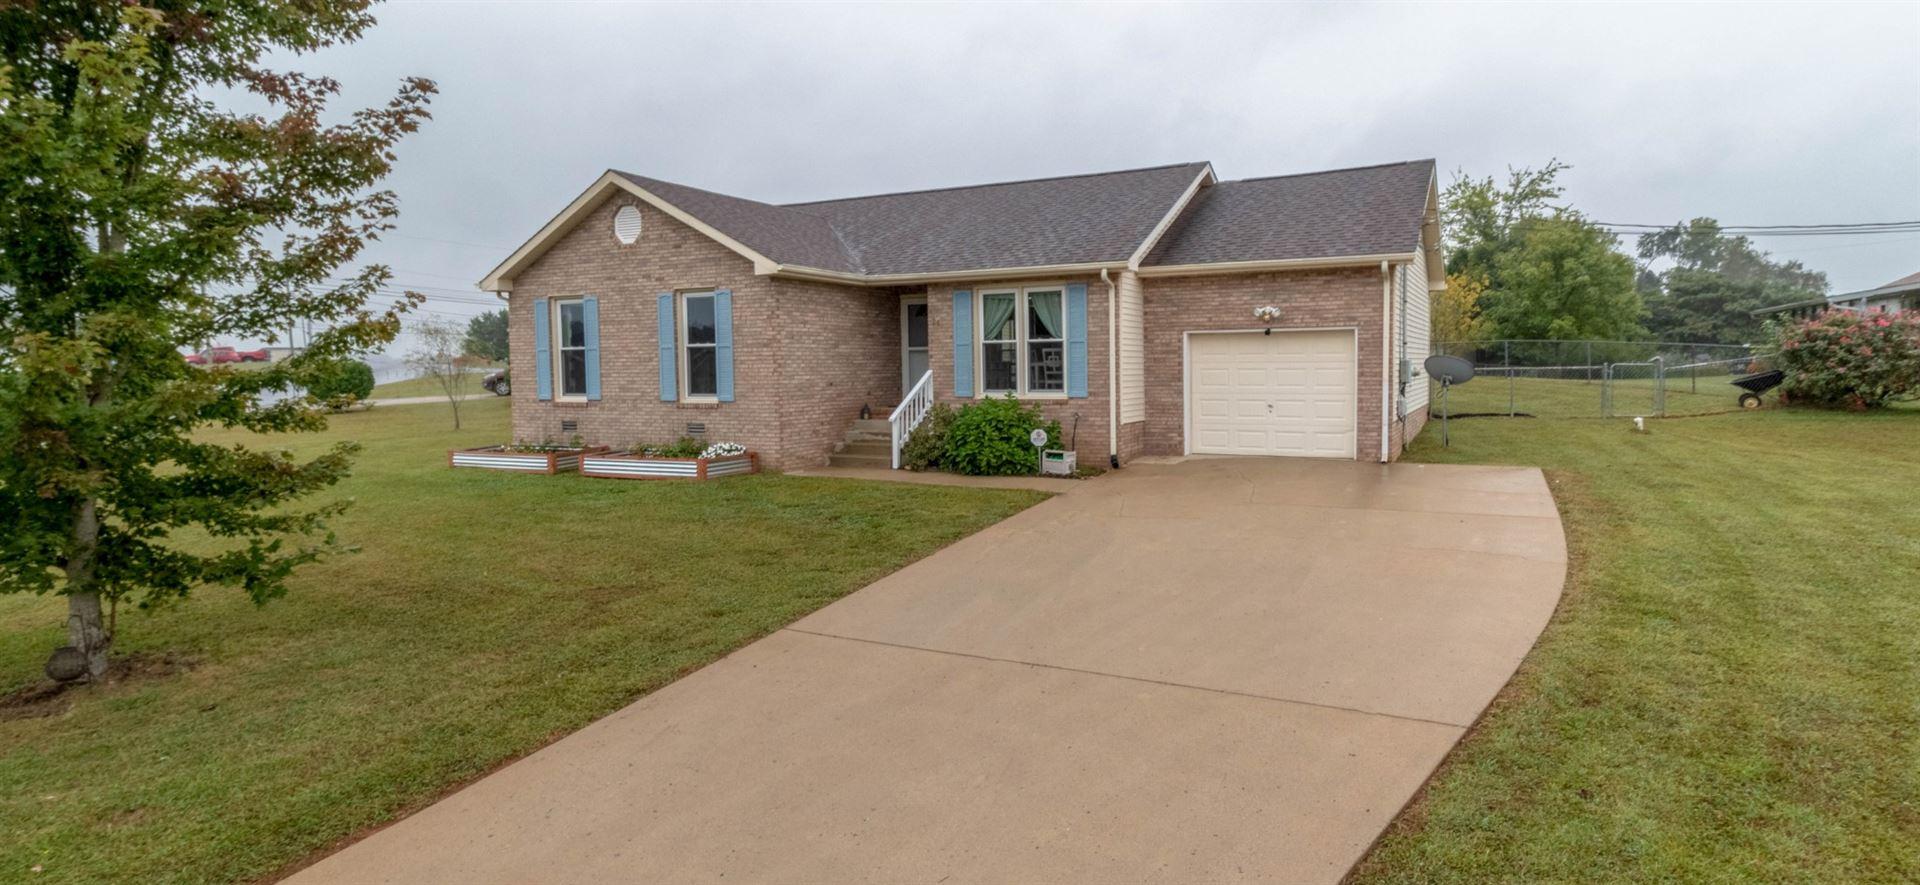 244 Short St, Clarksville, TN 37042 - MLS#: 2192709